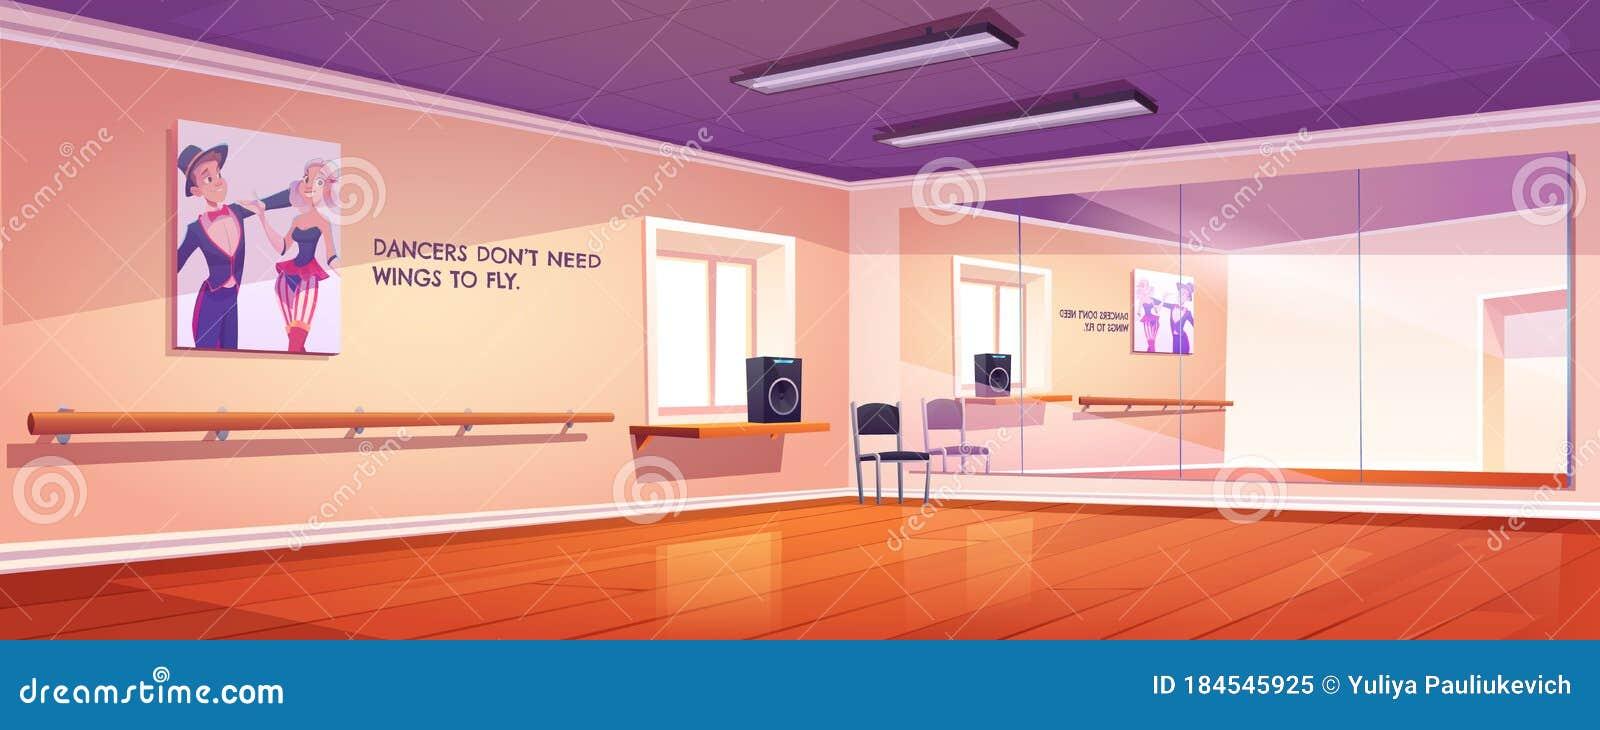 Dance Studio Ballet Class Interior With Mirrors Stock Vector Illustration Of Design Dancing 184545925